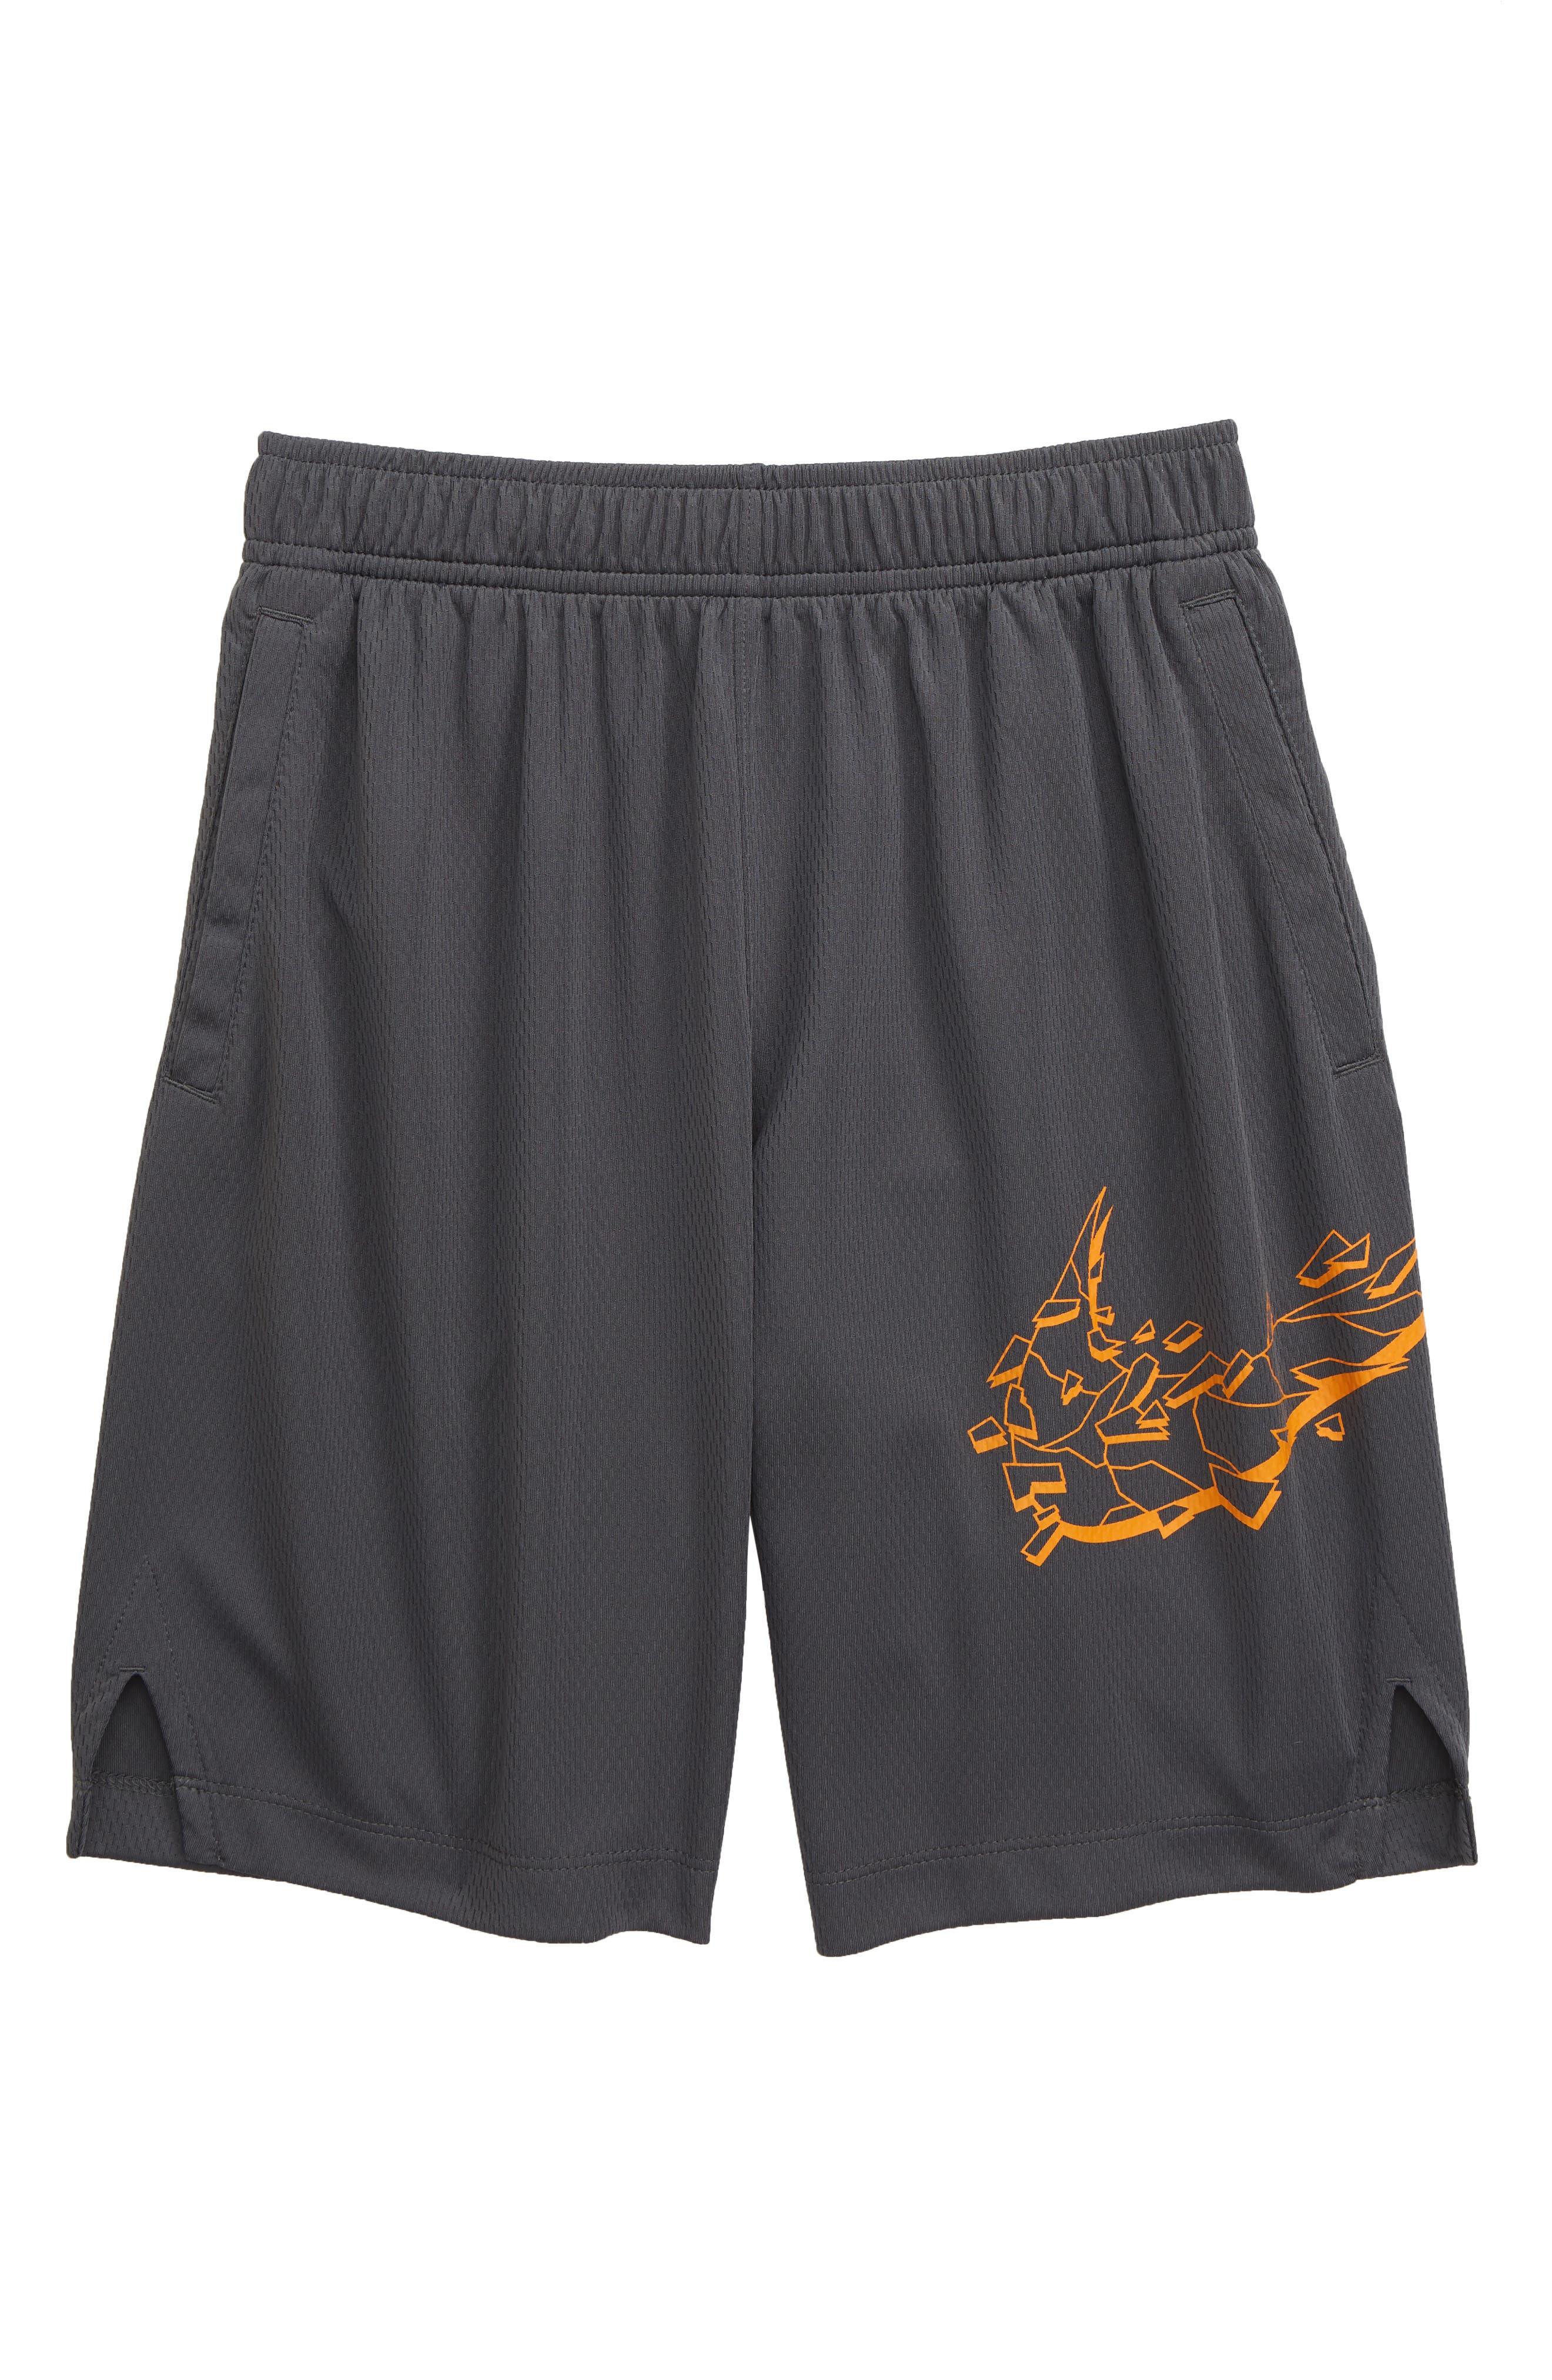 Dri-FIT Graphic Training Shorts, Main, color, DARK GREY / ORANGE PEEL